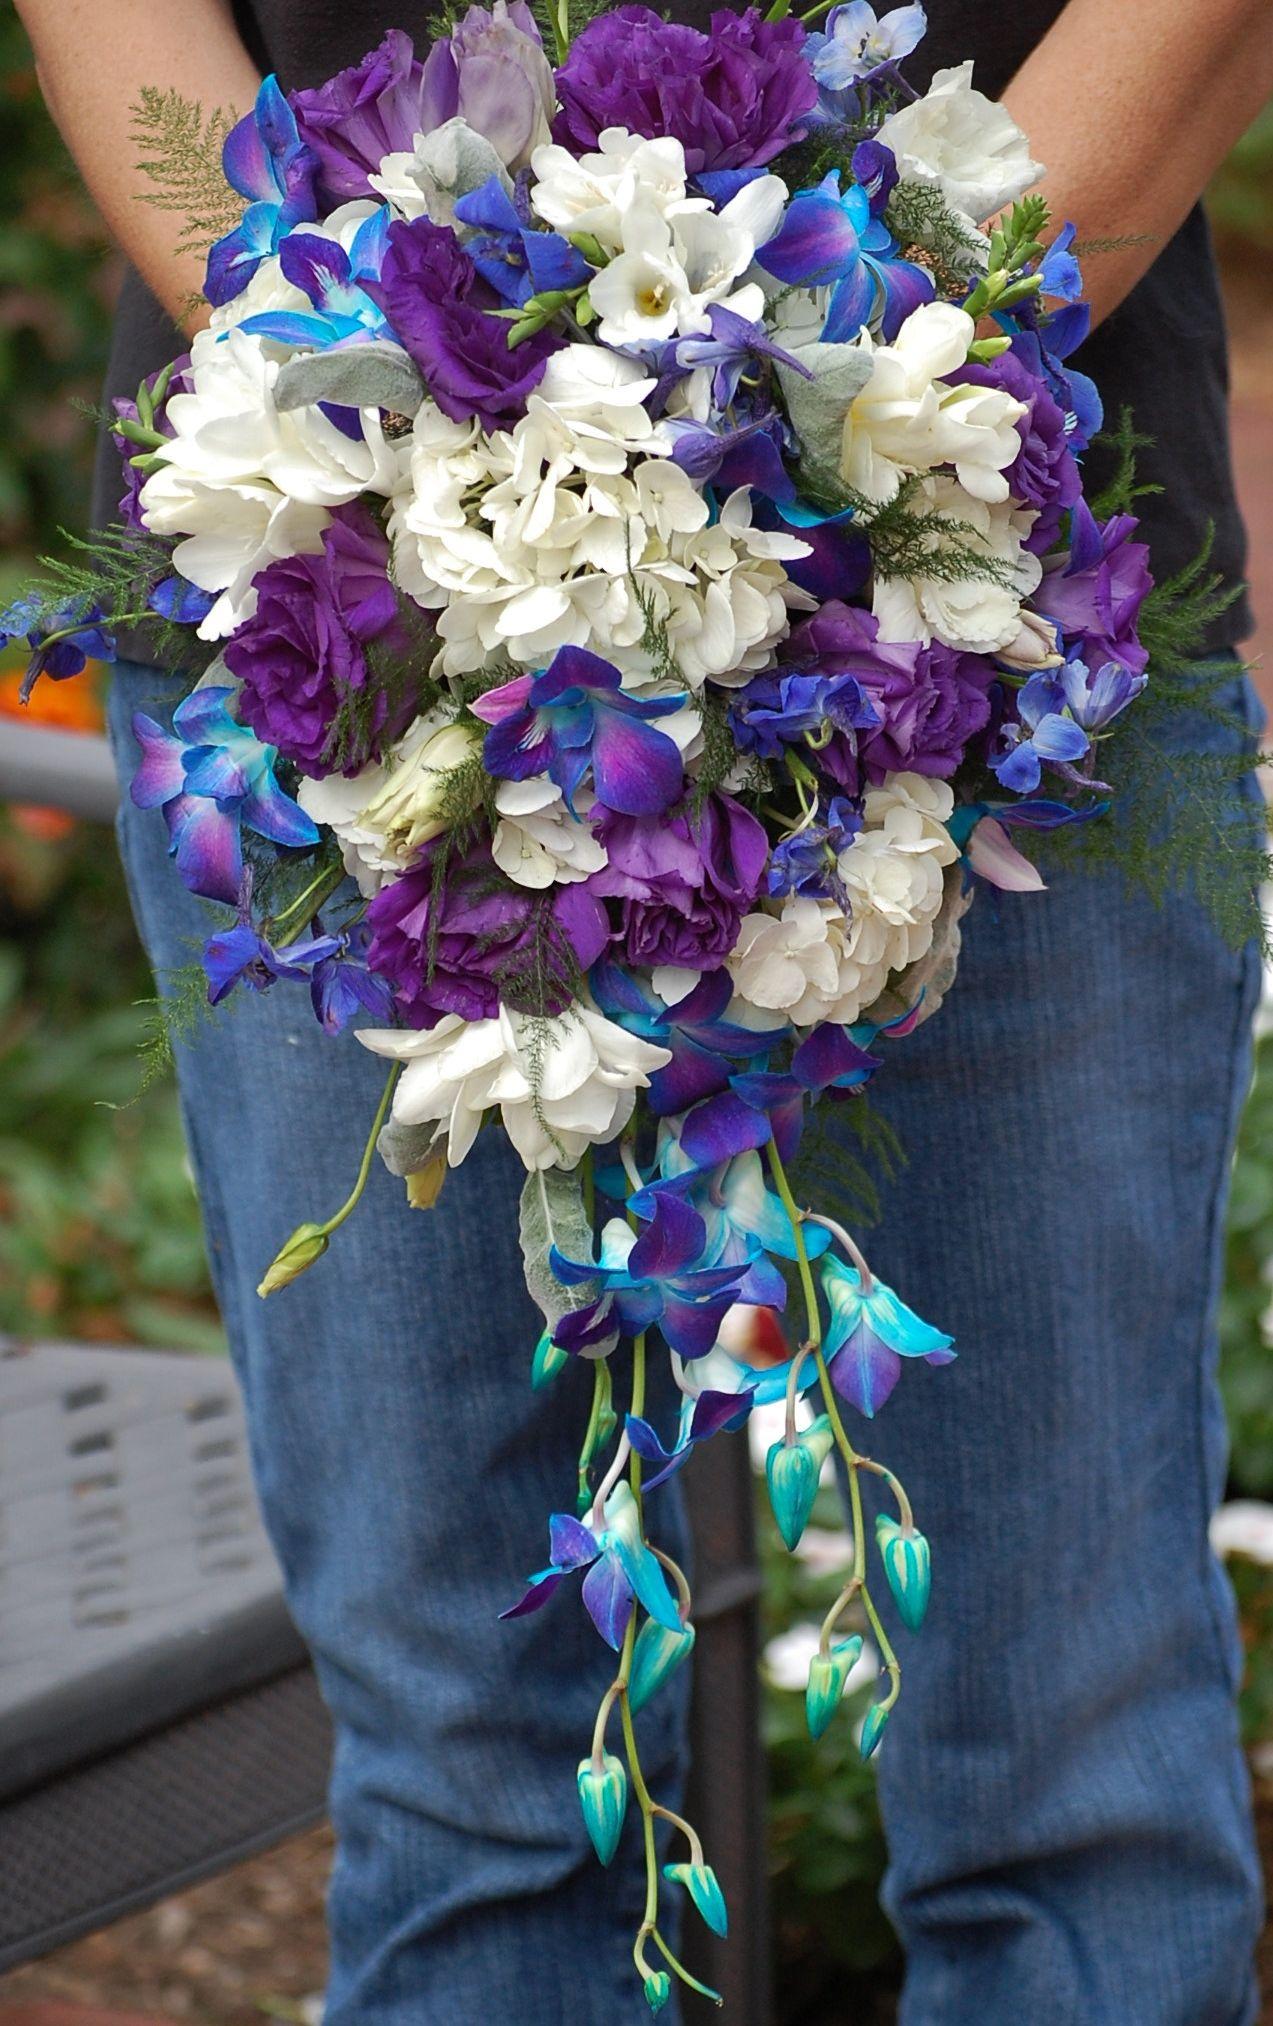 Bridal bouquet of white hydrangea white freesia dark purple